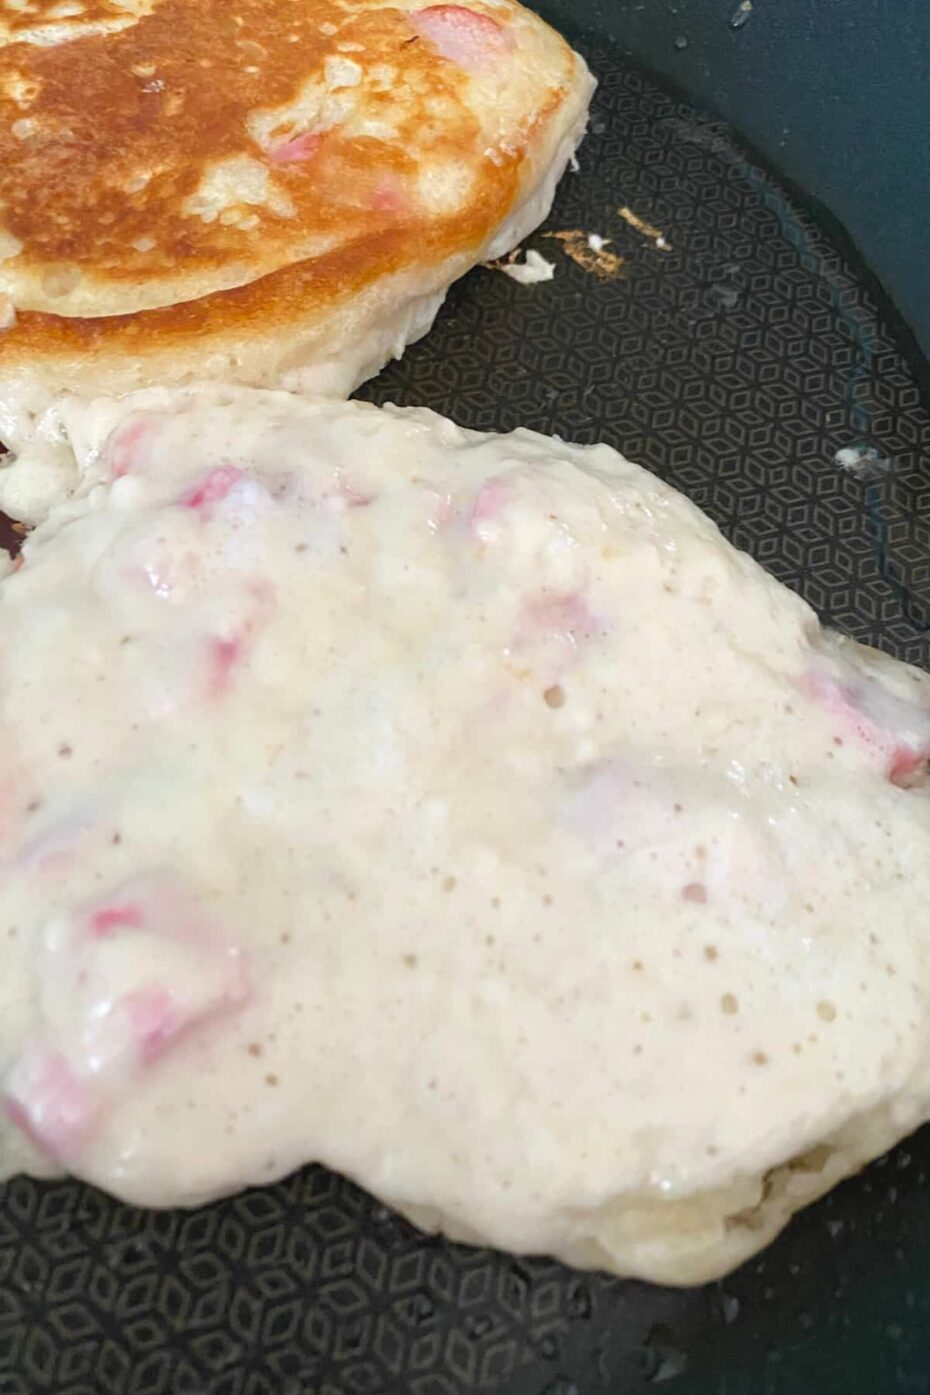 Fluffy Rhubarb Pancakes, showing bubbles in pancake